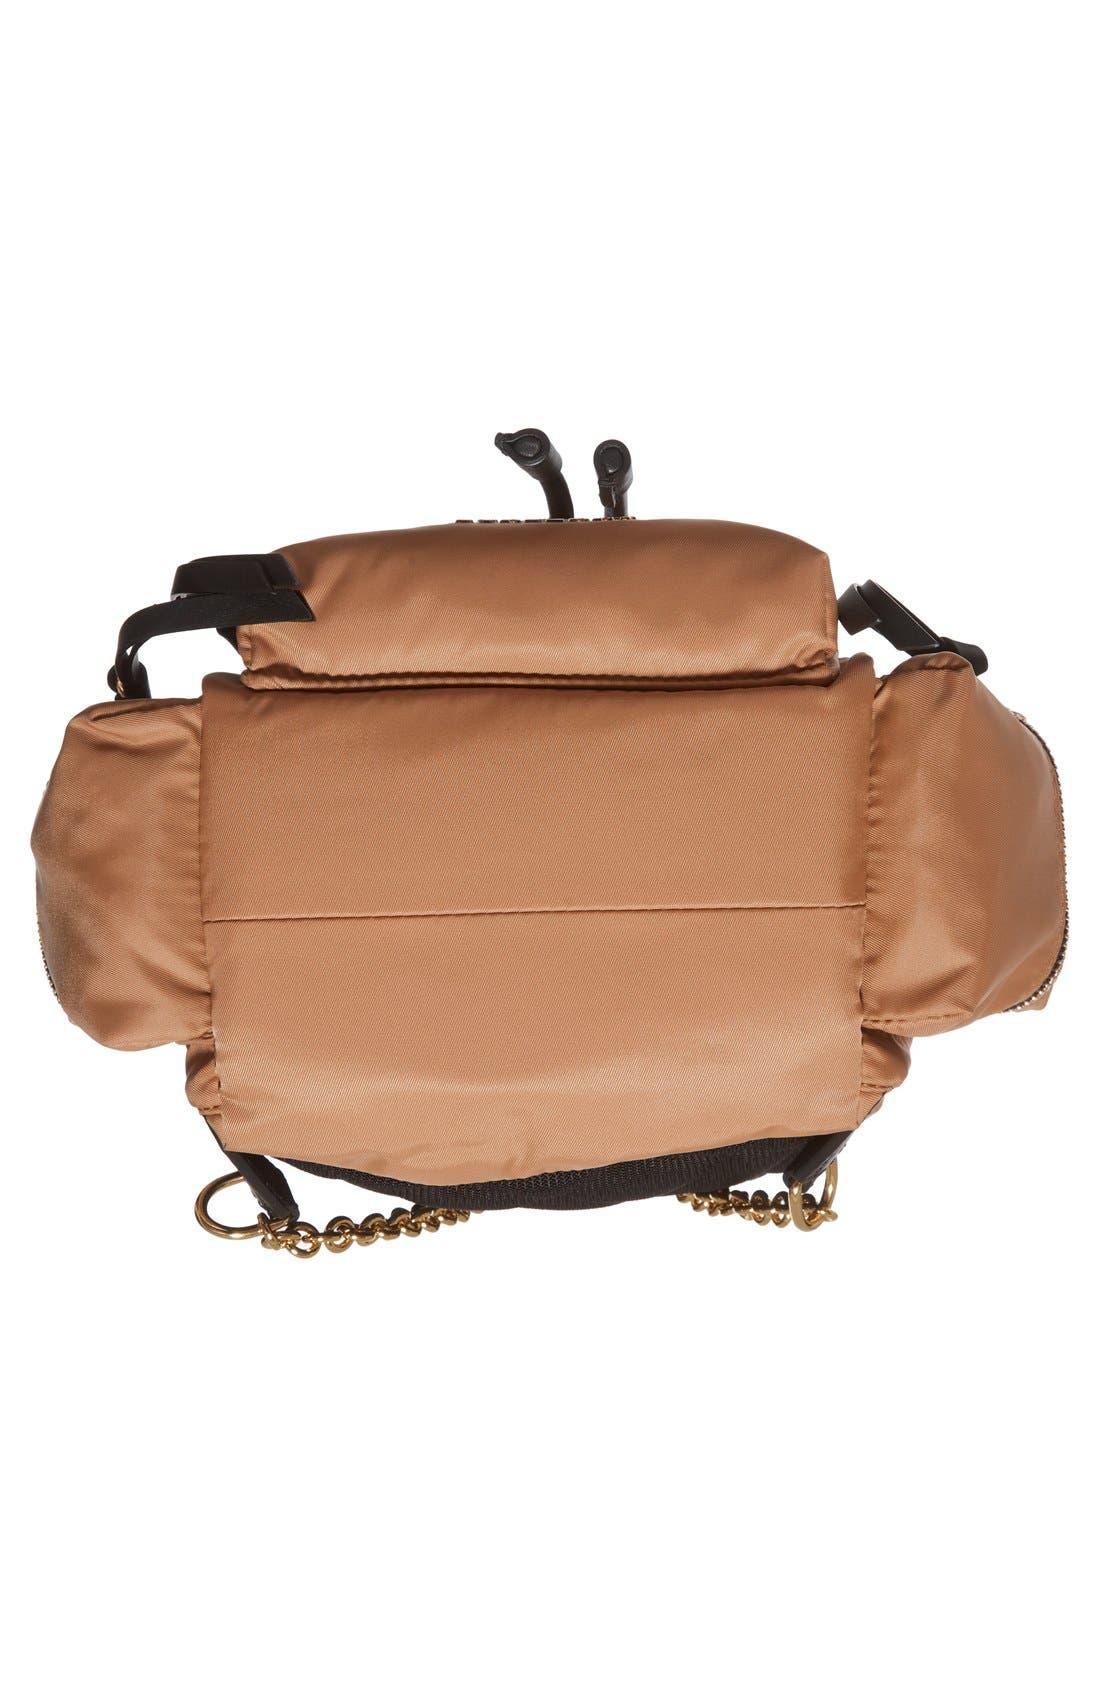 'Small Runway Rucksack' Nylon Backpack,                             Alternate thumbnail 6, color,                             272